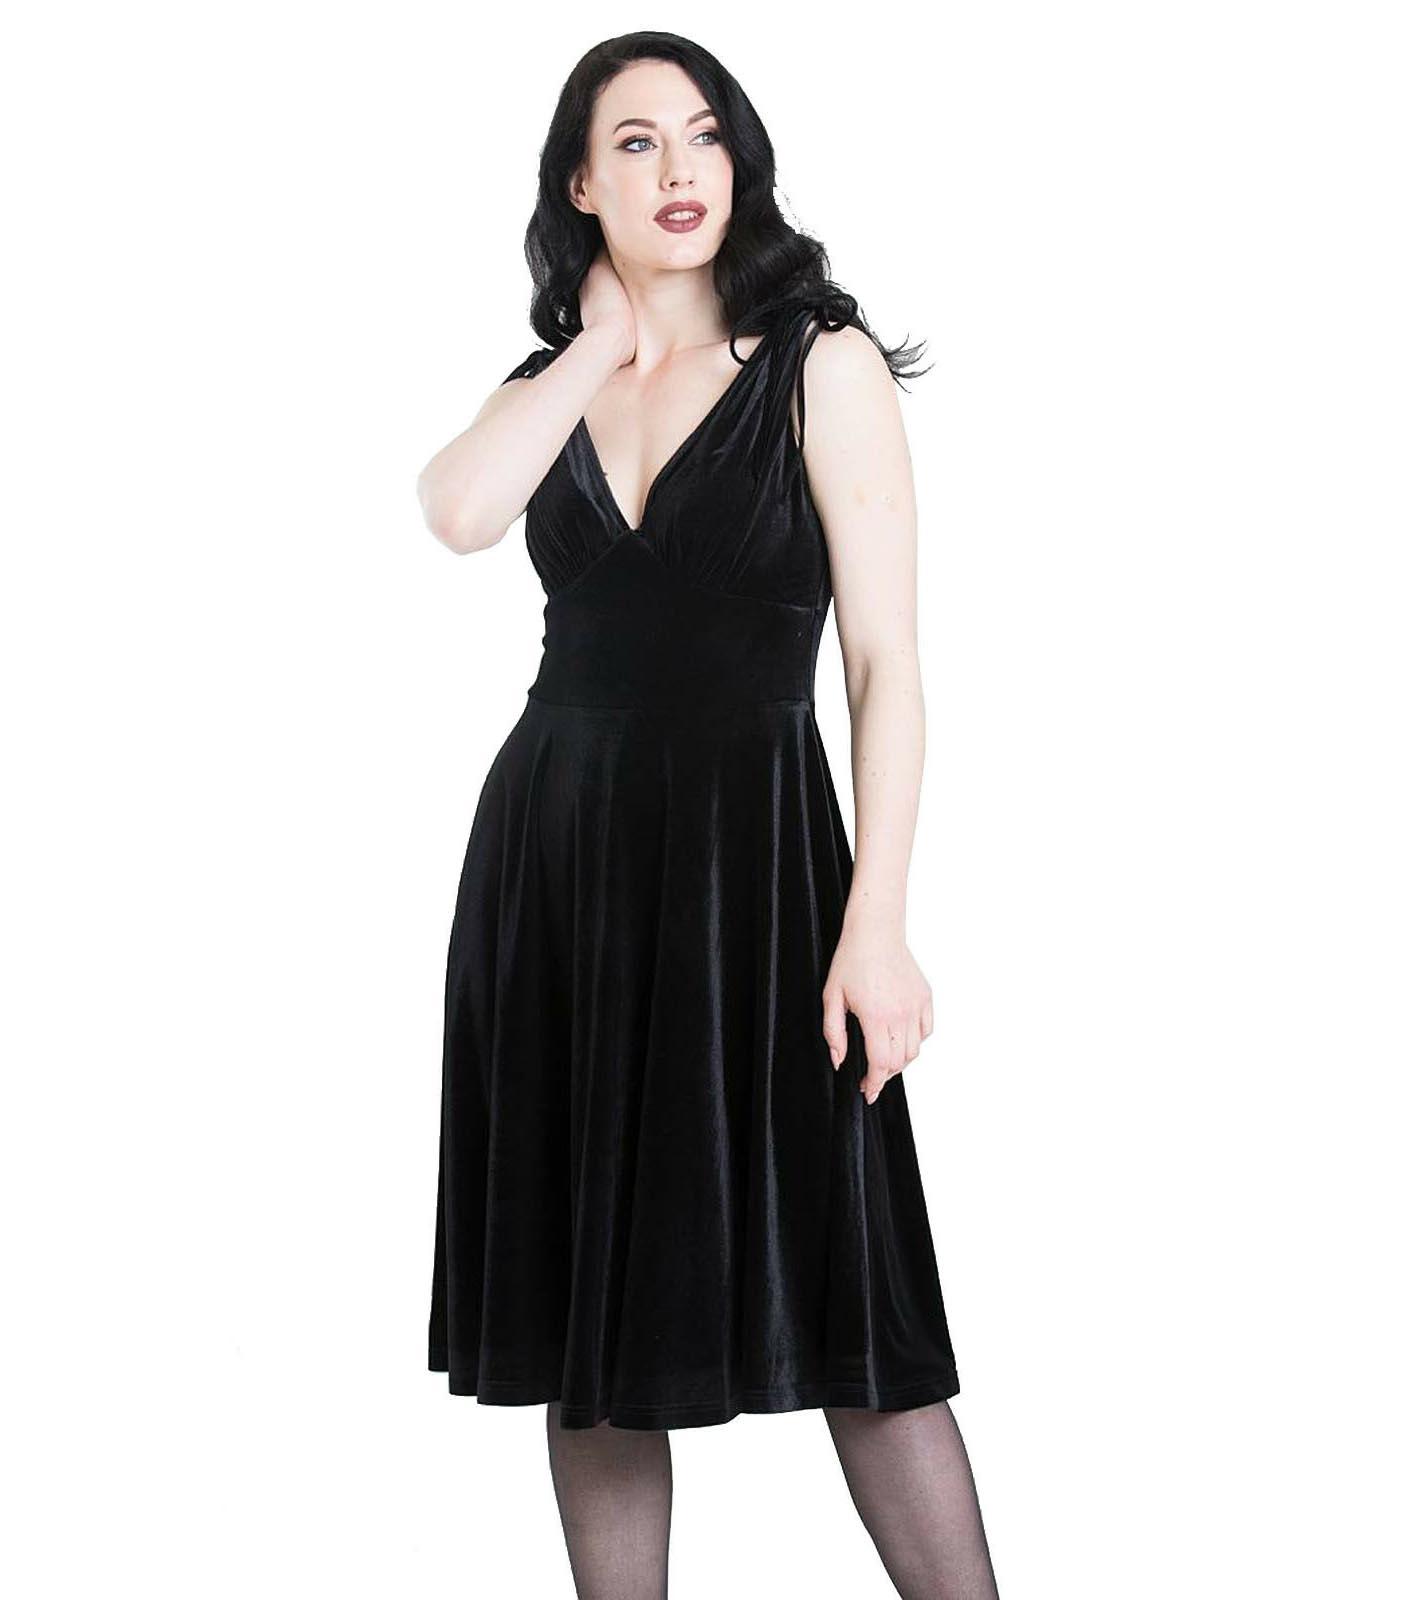 Hell-Bunny-40s-50s-Elegant-Pin-Up-Dress-MELINA-Crushed-Velvet-Black-All-Sizes thumbnail 11